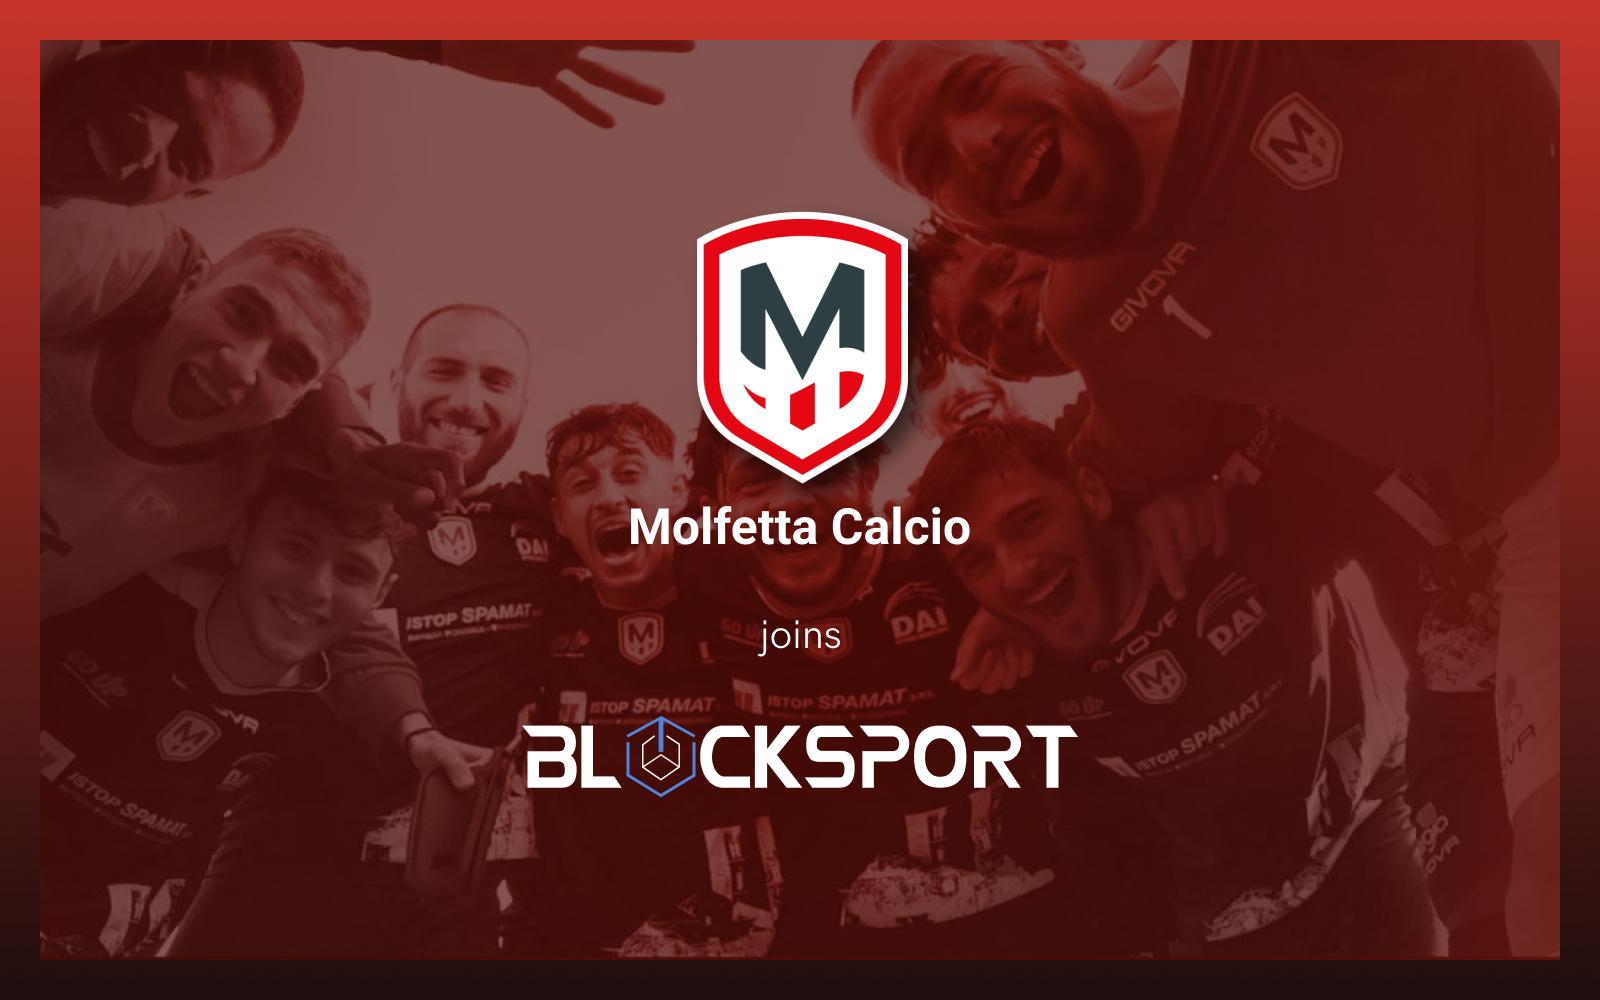 Partnership with Molfetta Calcio